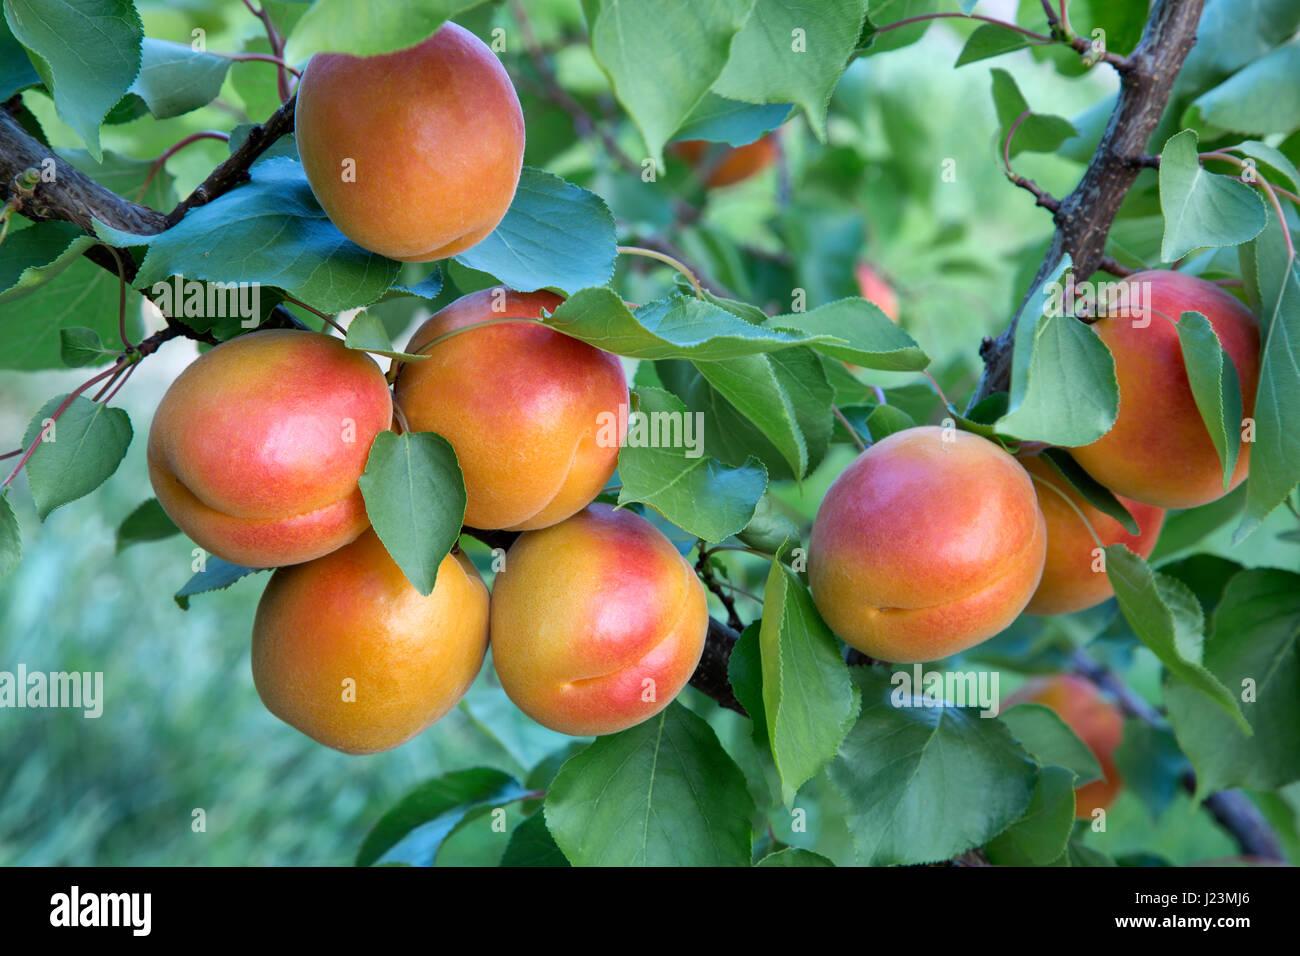 Apricots 'Robada' variety maturing on branch 'Prunus armaniaca', Washington State. - Stock Image